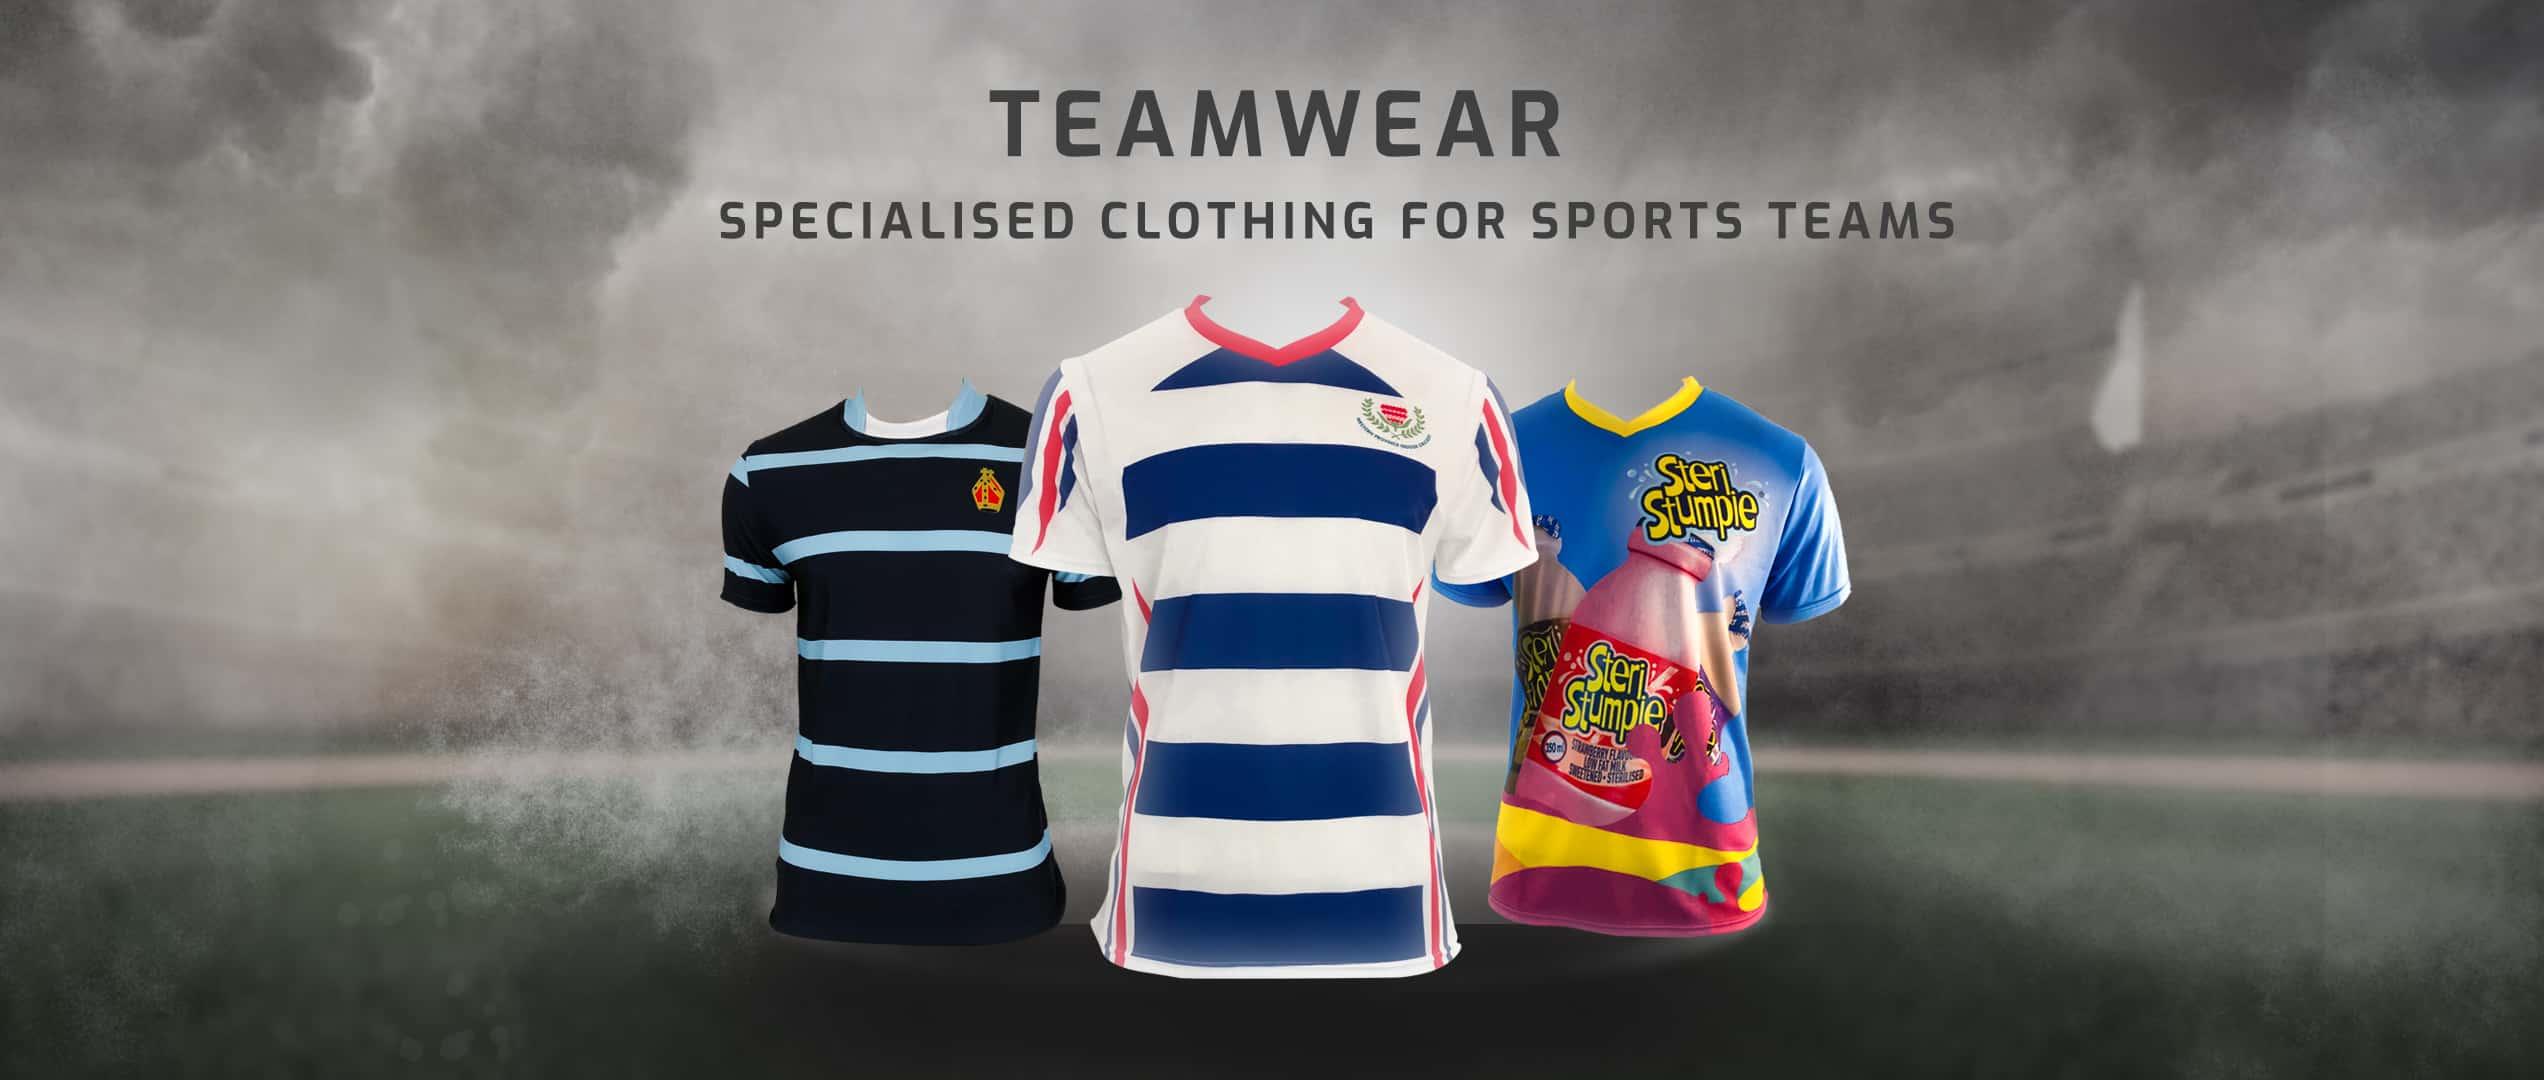 Teamwear - Shop Now